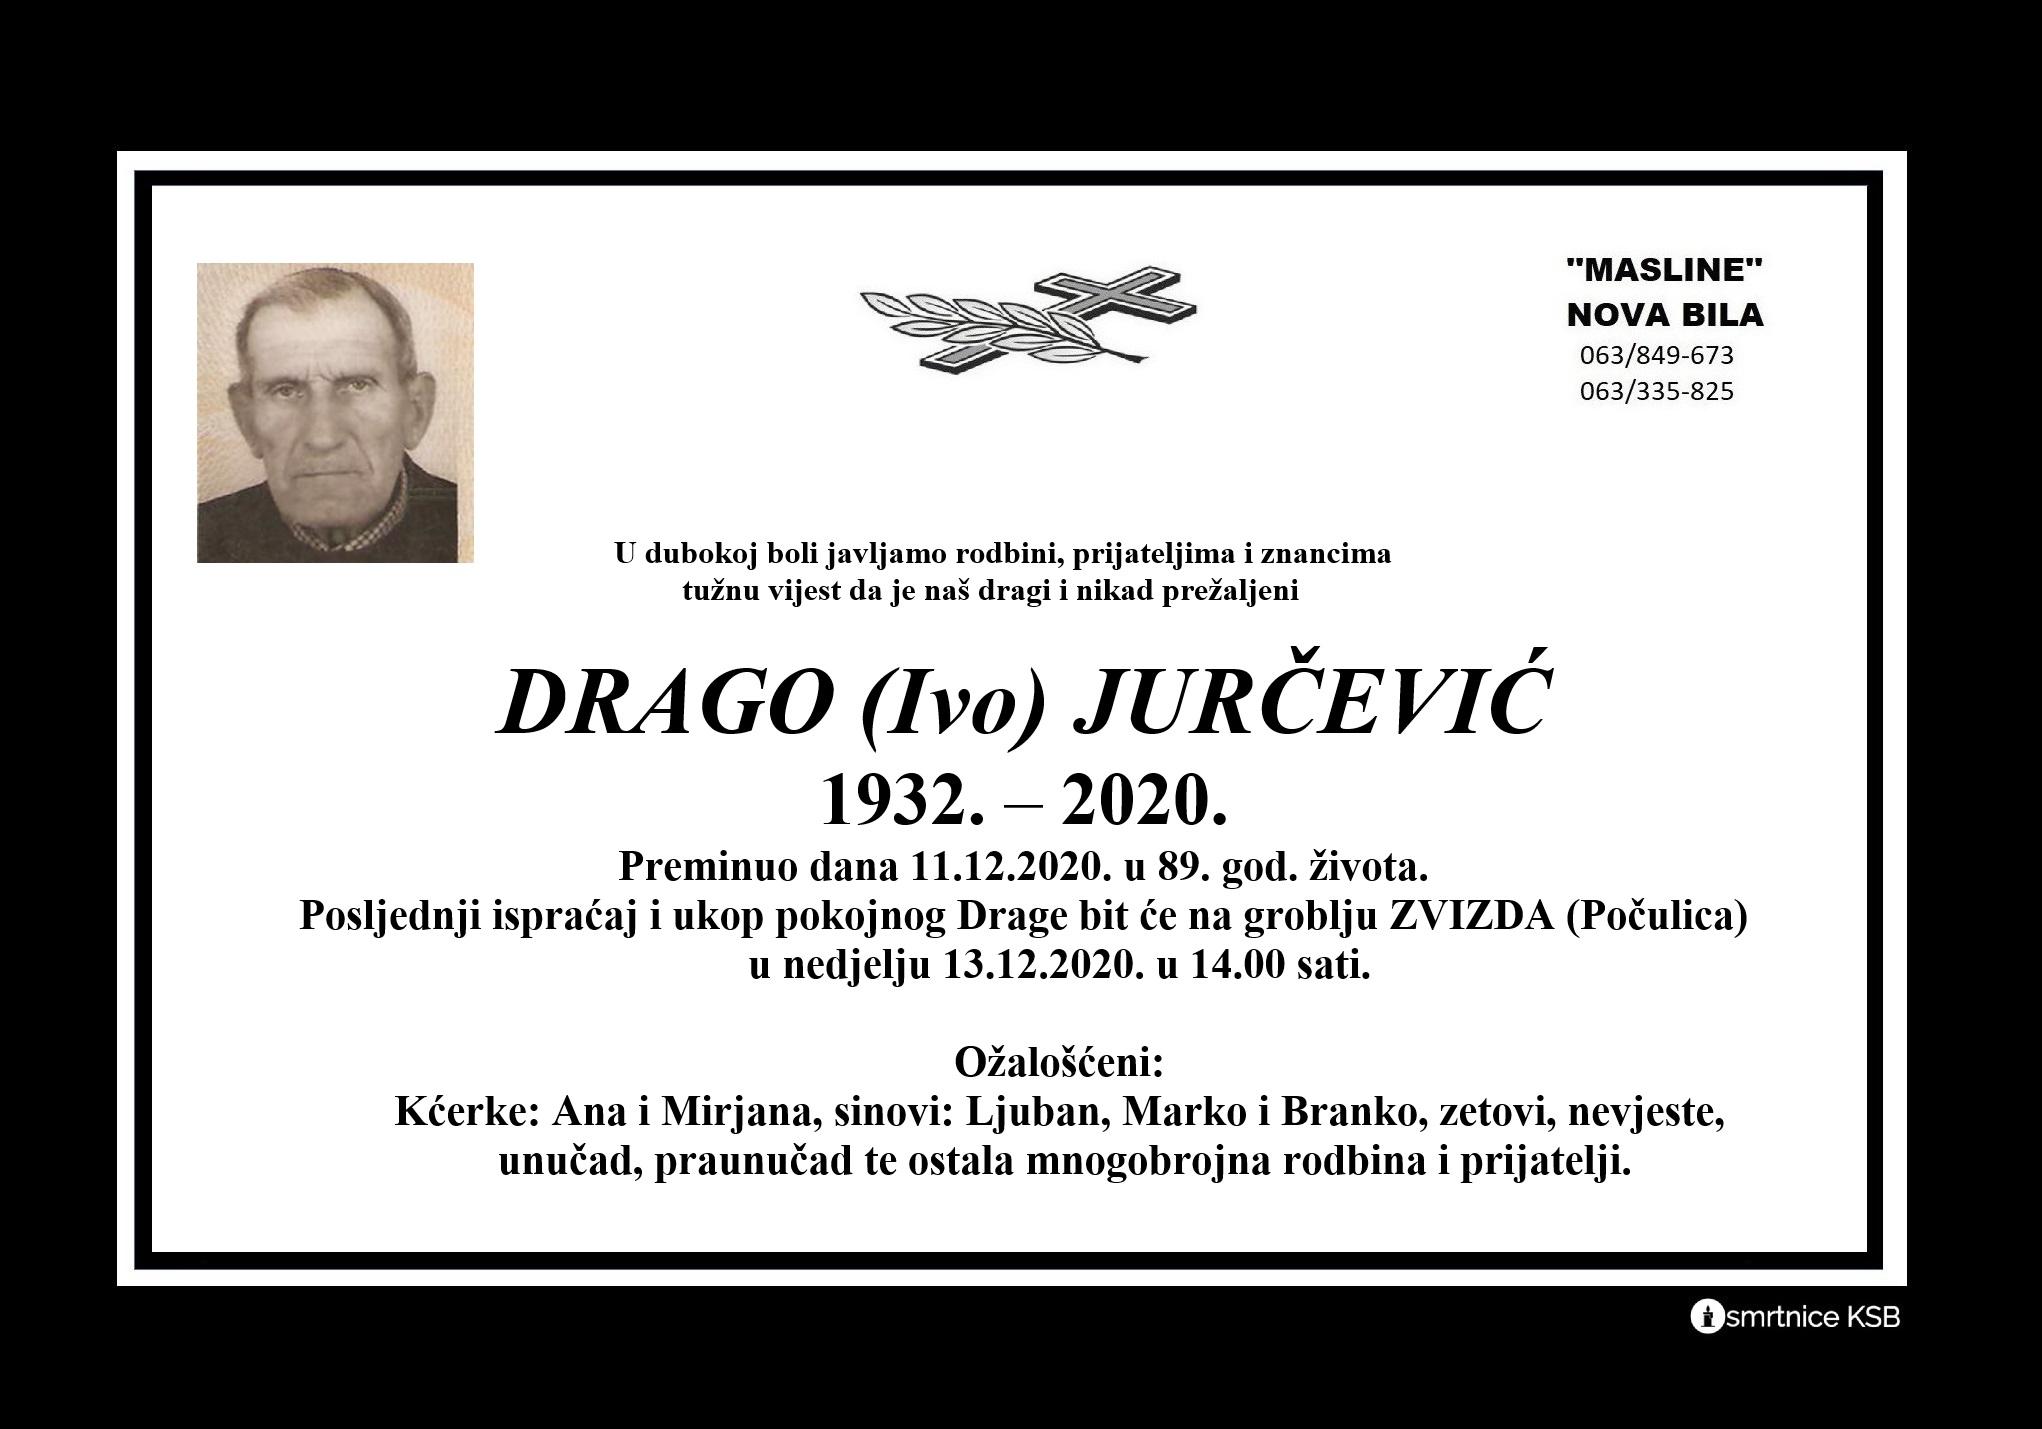 Drago (Ivo) Jurčević